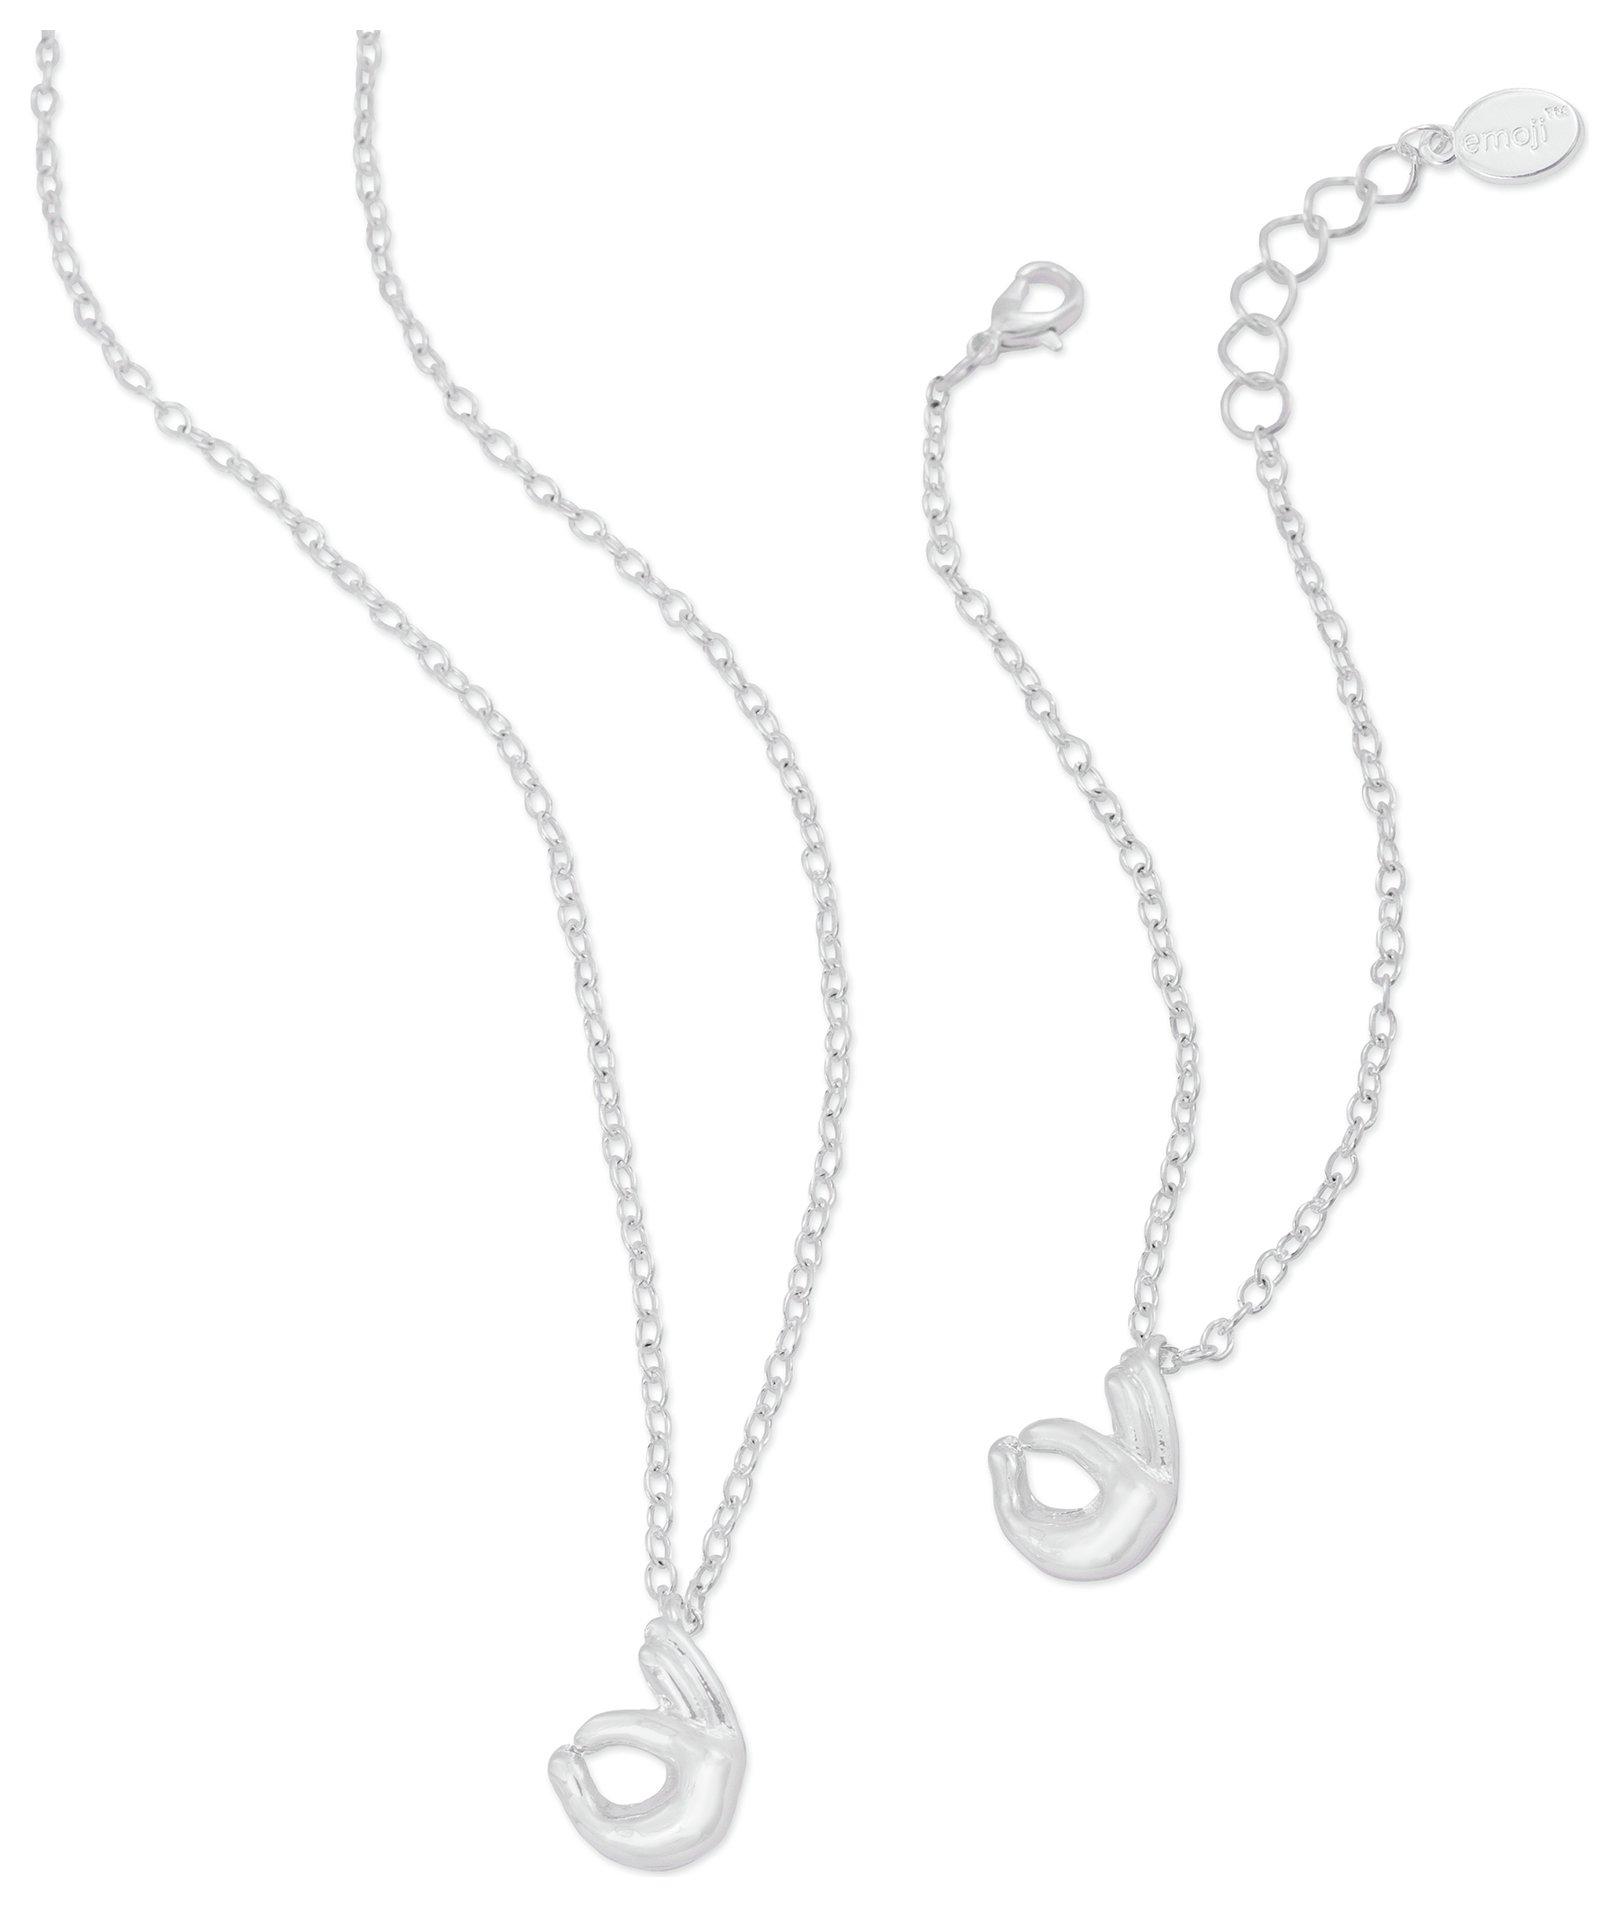 Image of Emoji OK Pendant and Bracelet Set